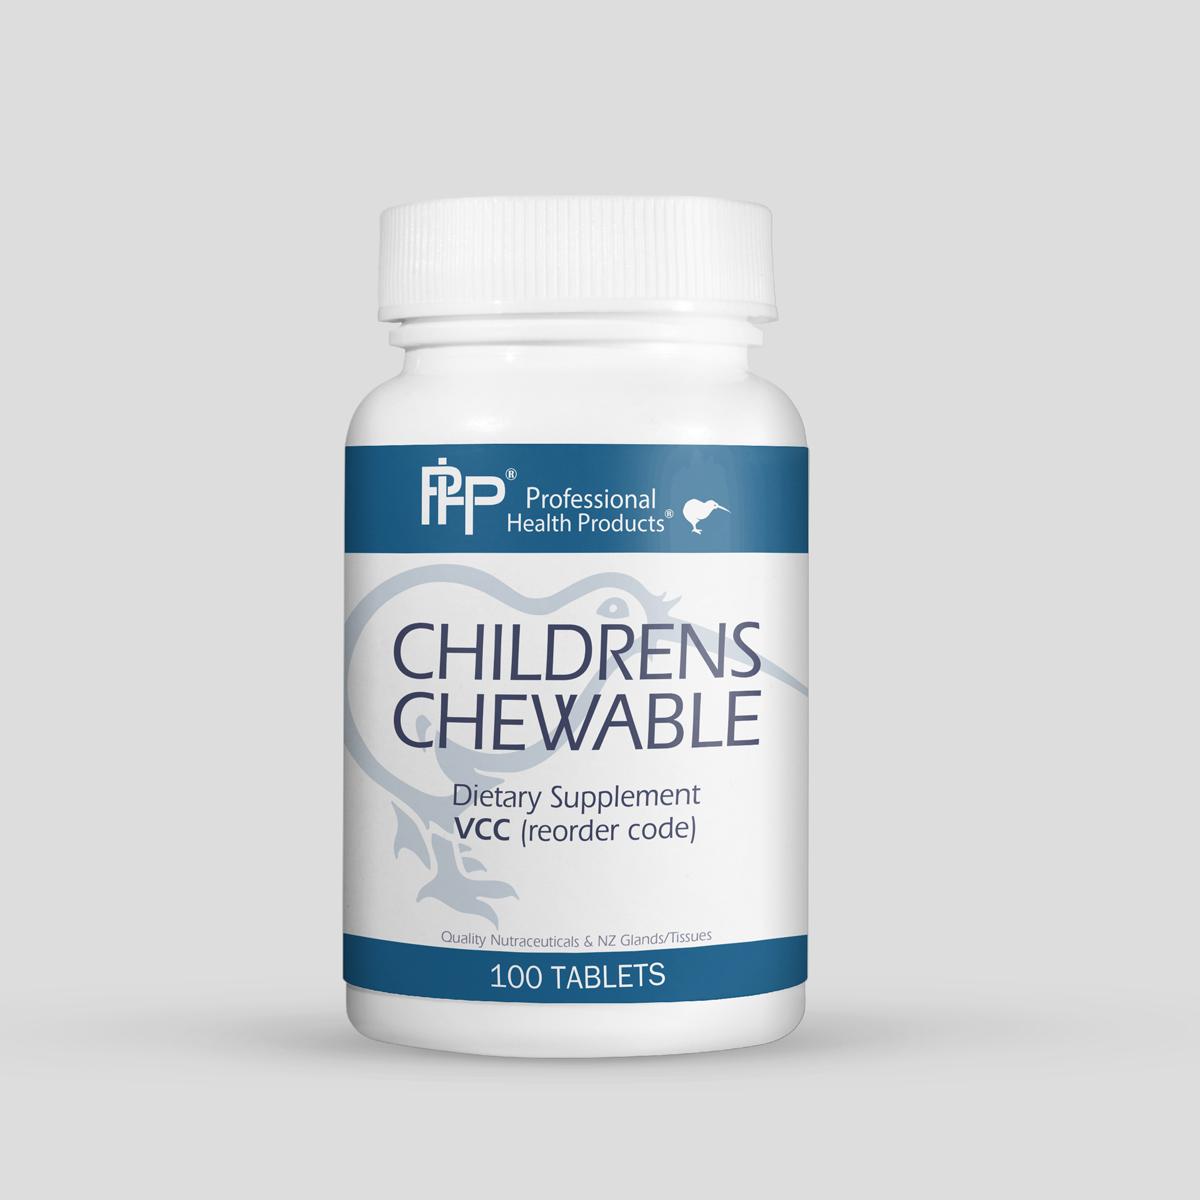 Children's Chewable